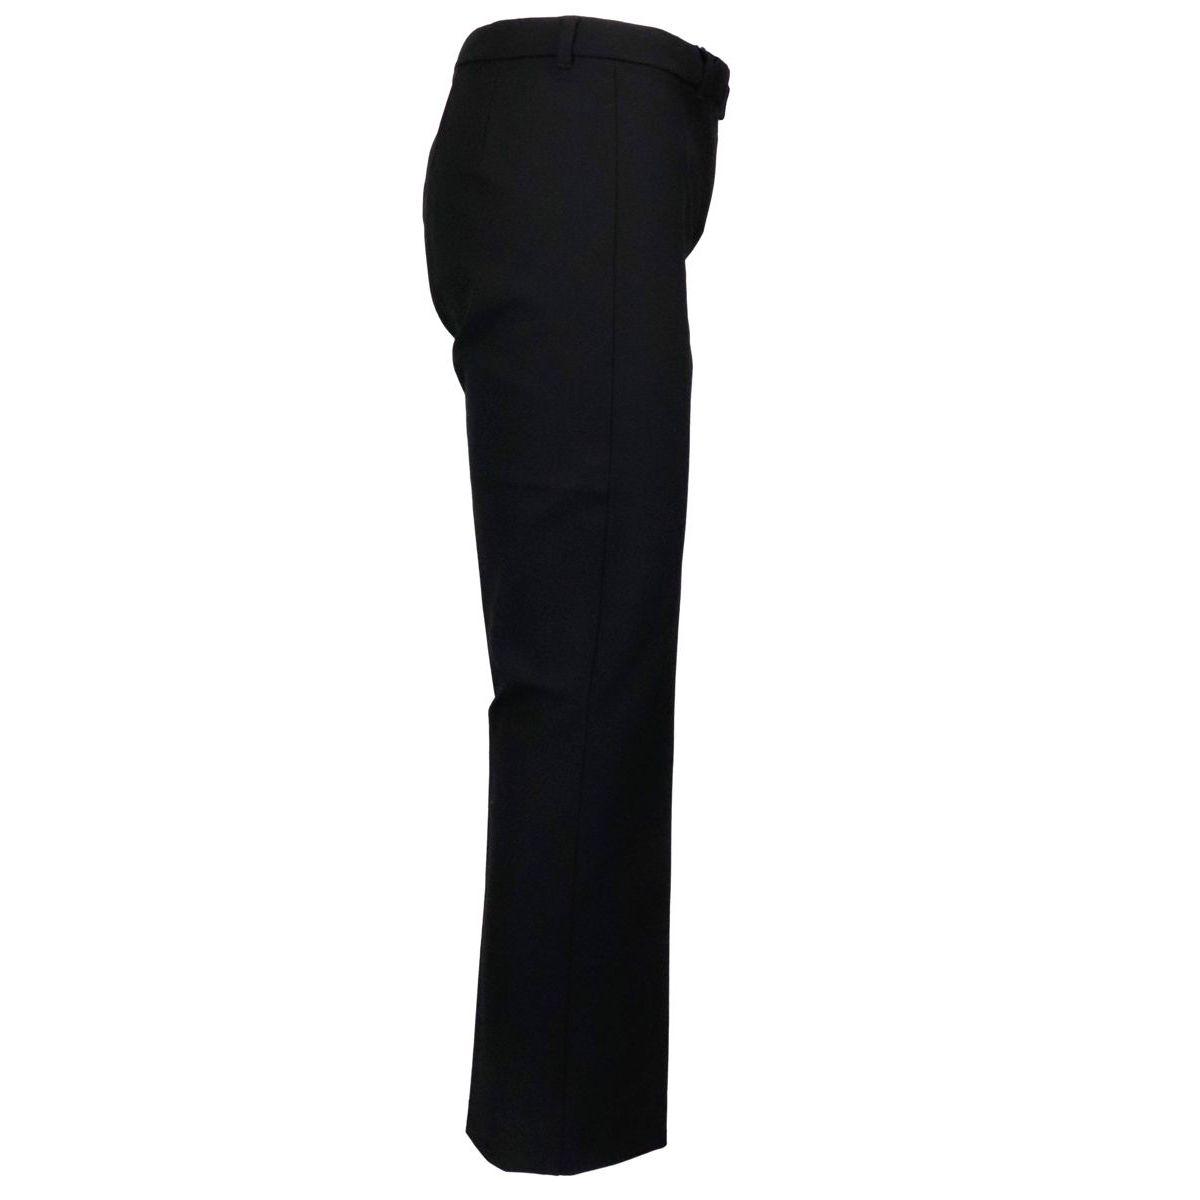 Men's trumpet trousers in cotton Black S MAX MARA